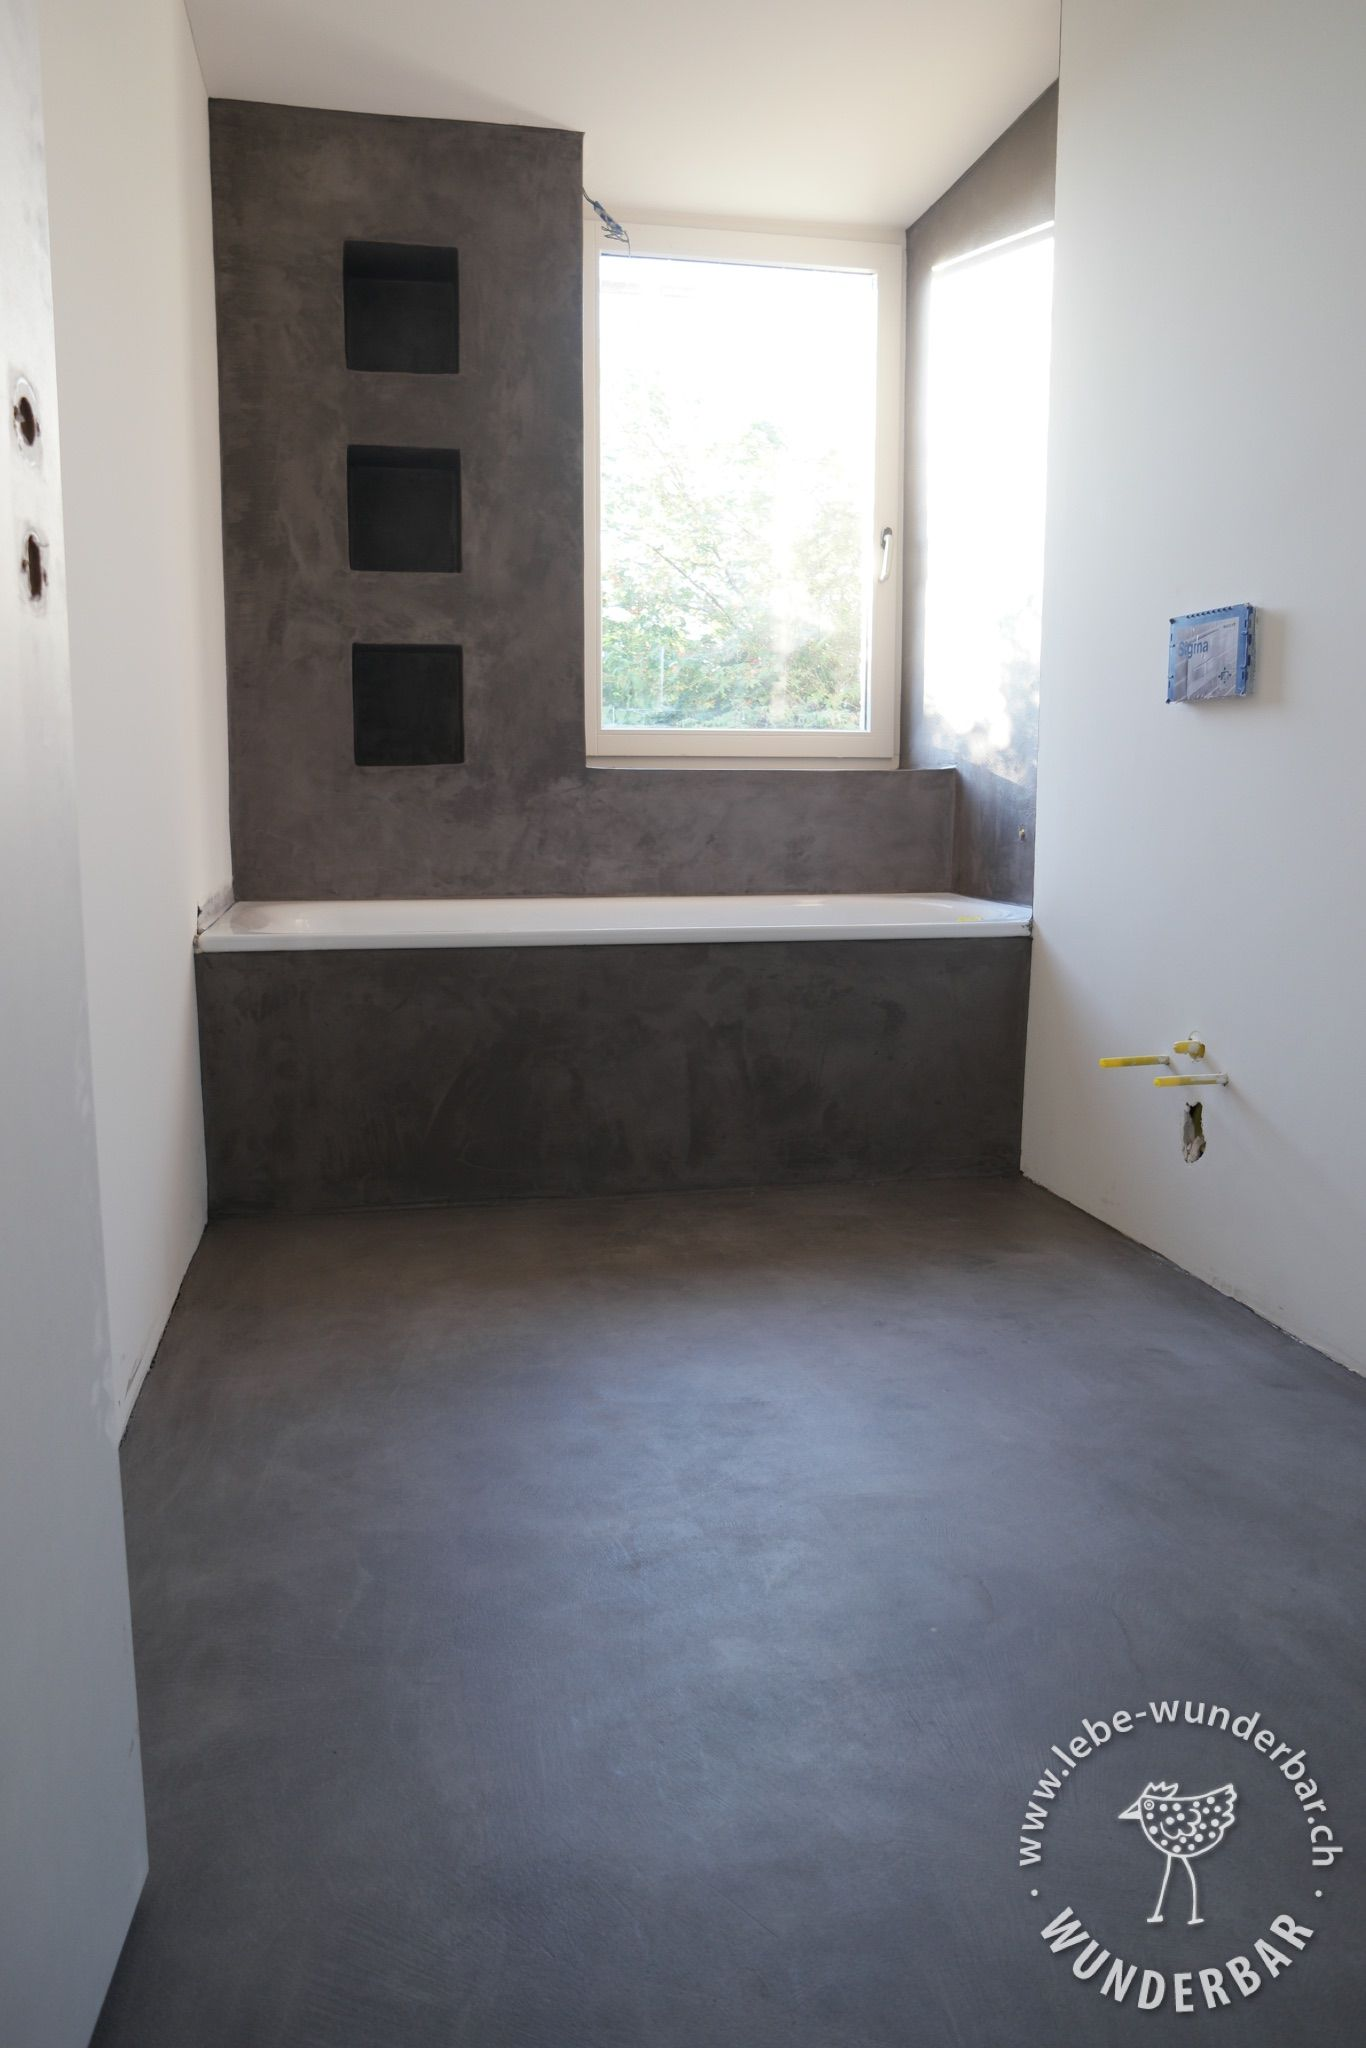 Haussanierung mineralischer wand bodenbelag making of badezimmer baden bad - Bodenbelag badezimmer fugenlos ...